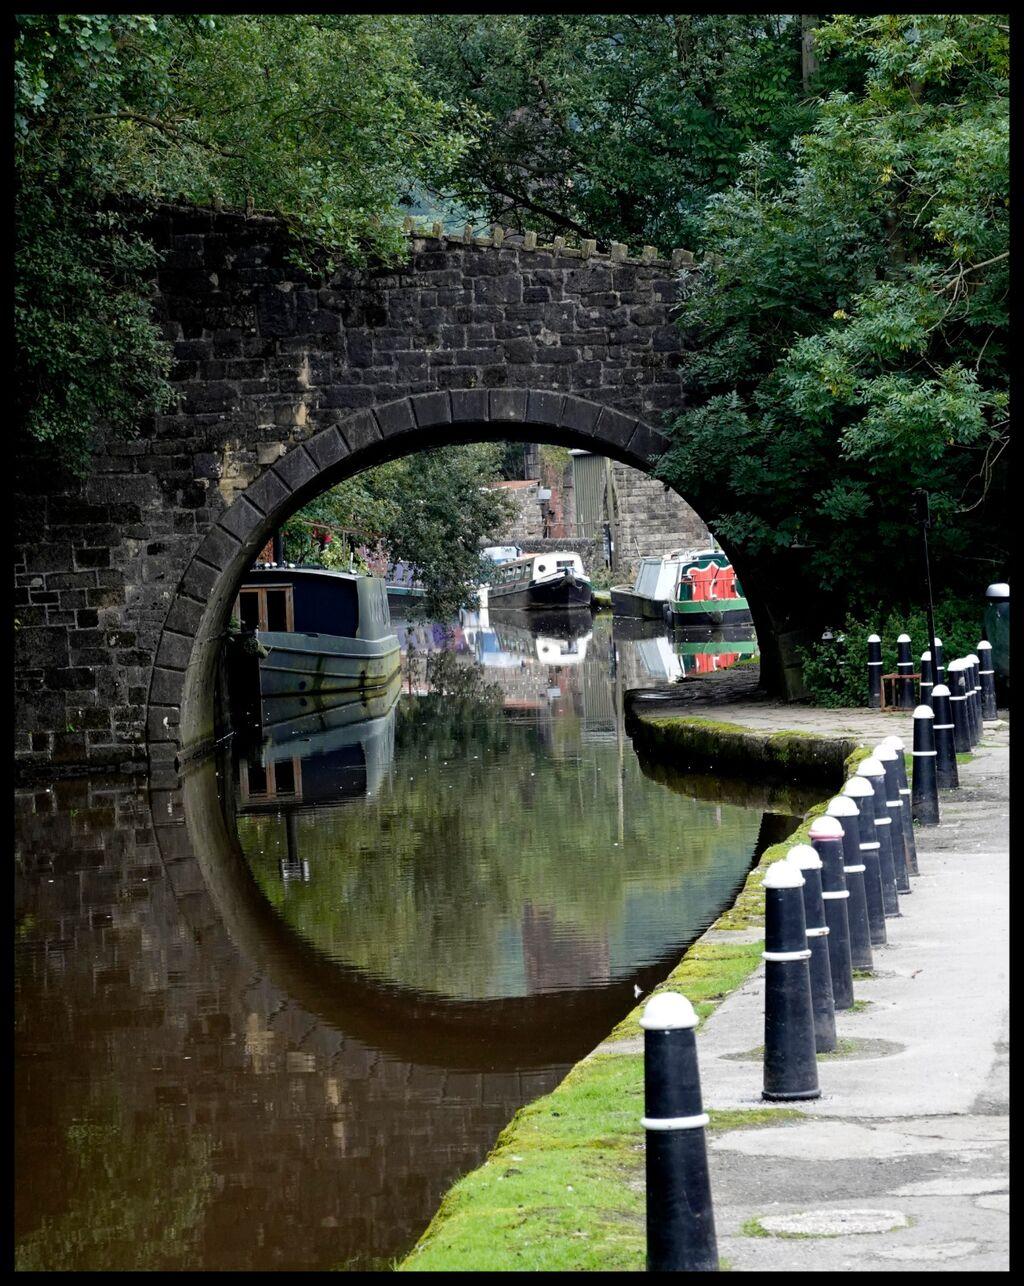 Squaring the circle; Hebden Bridge.